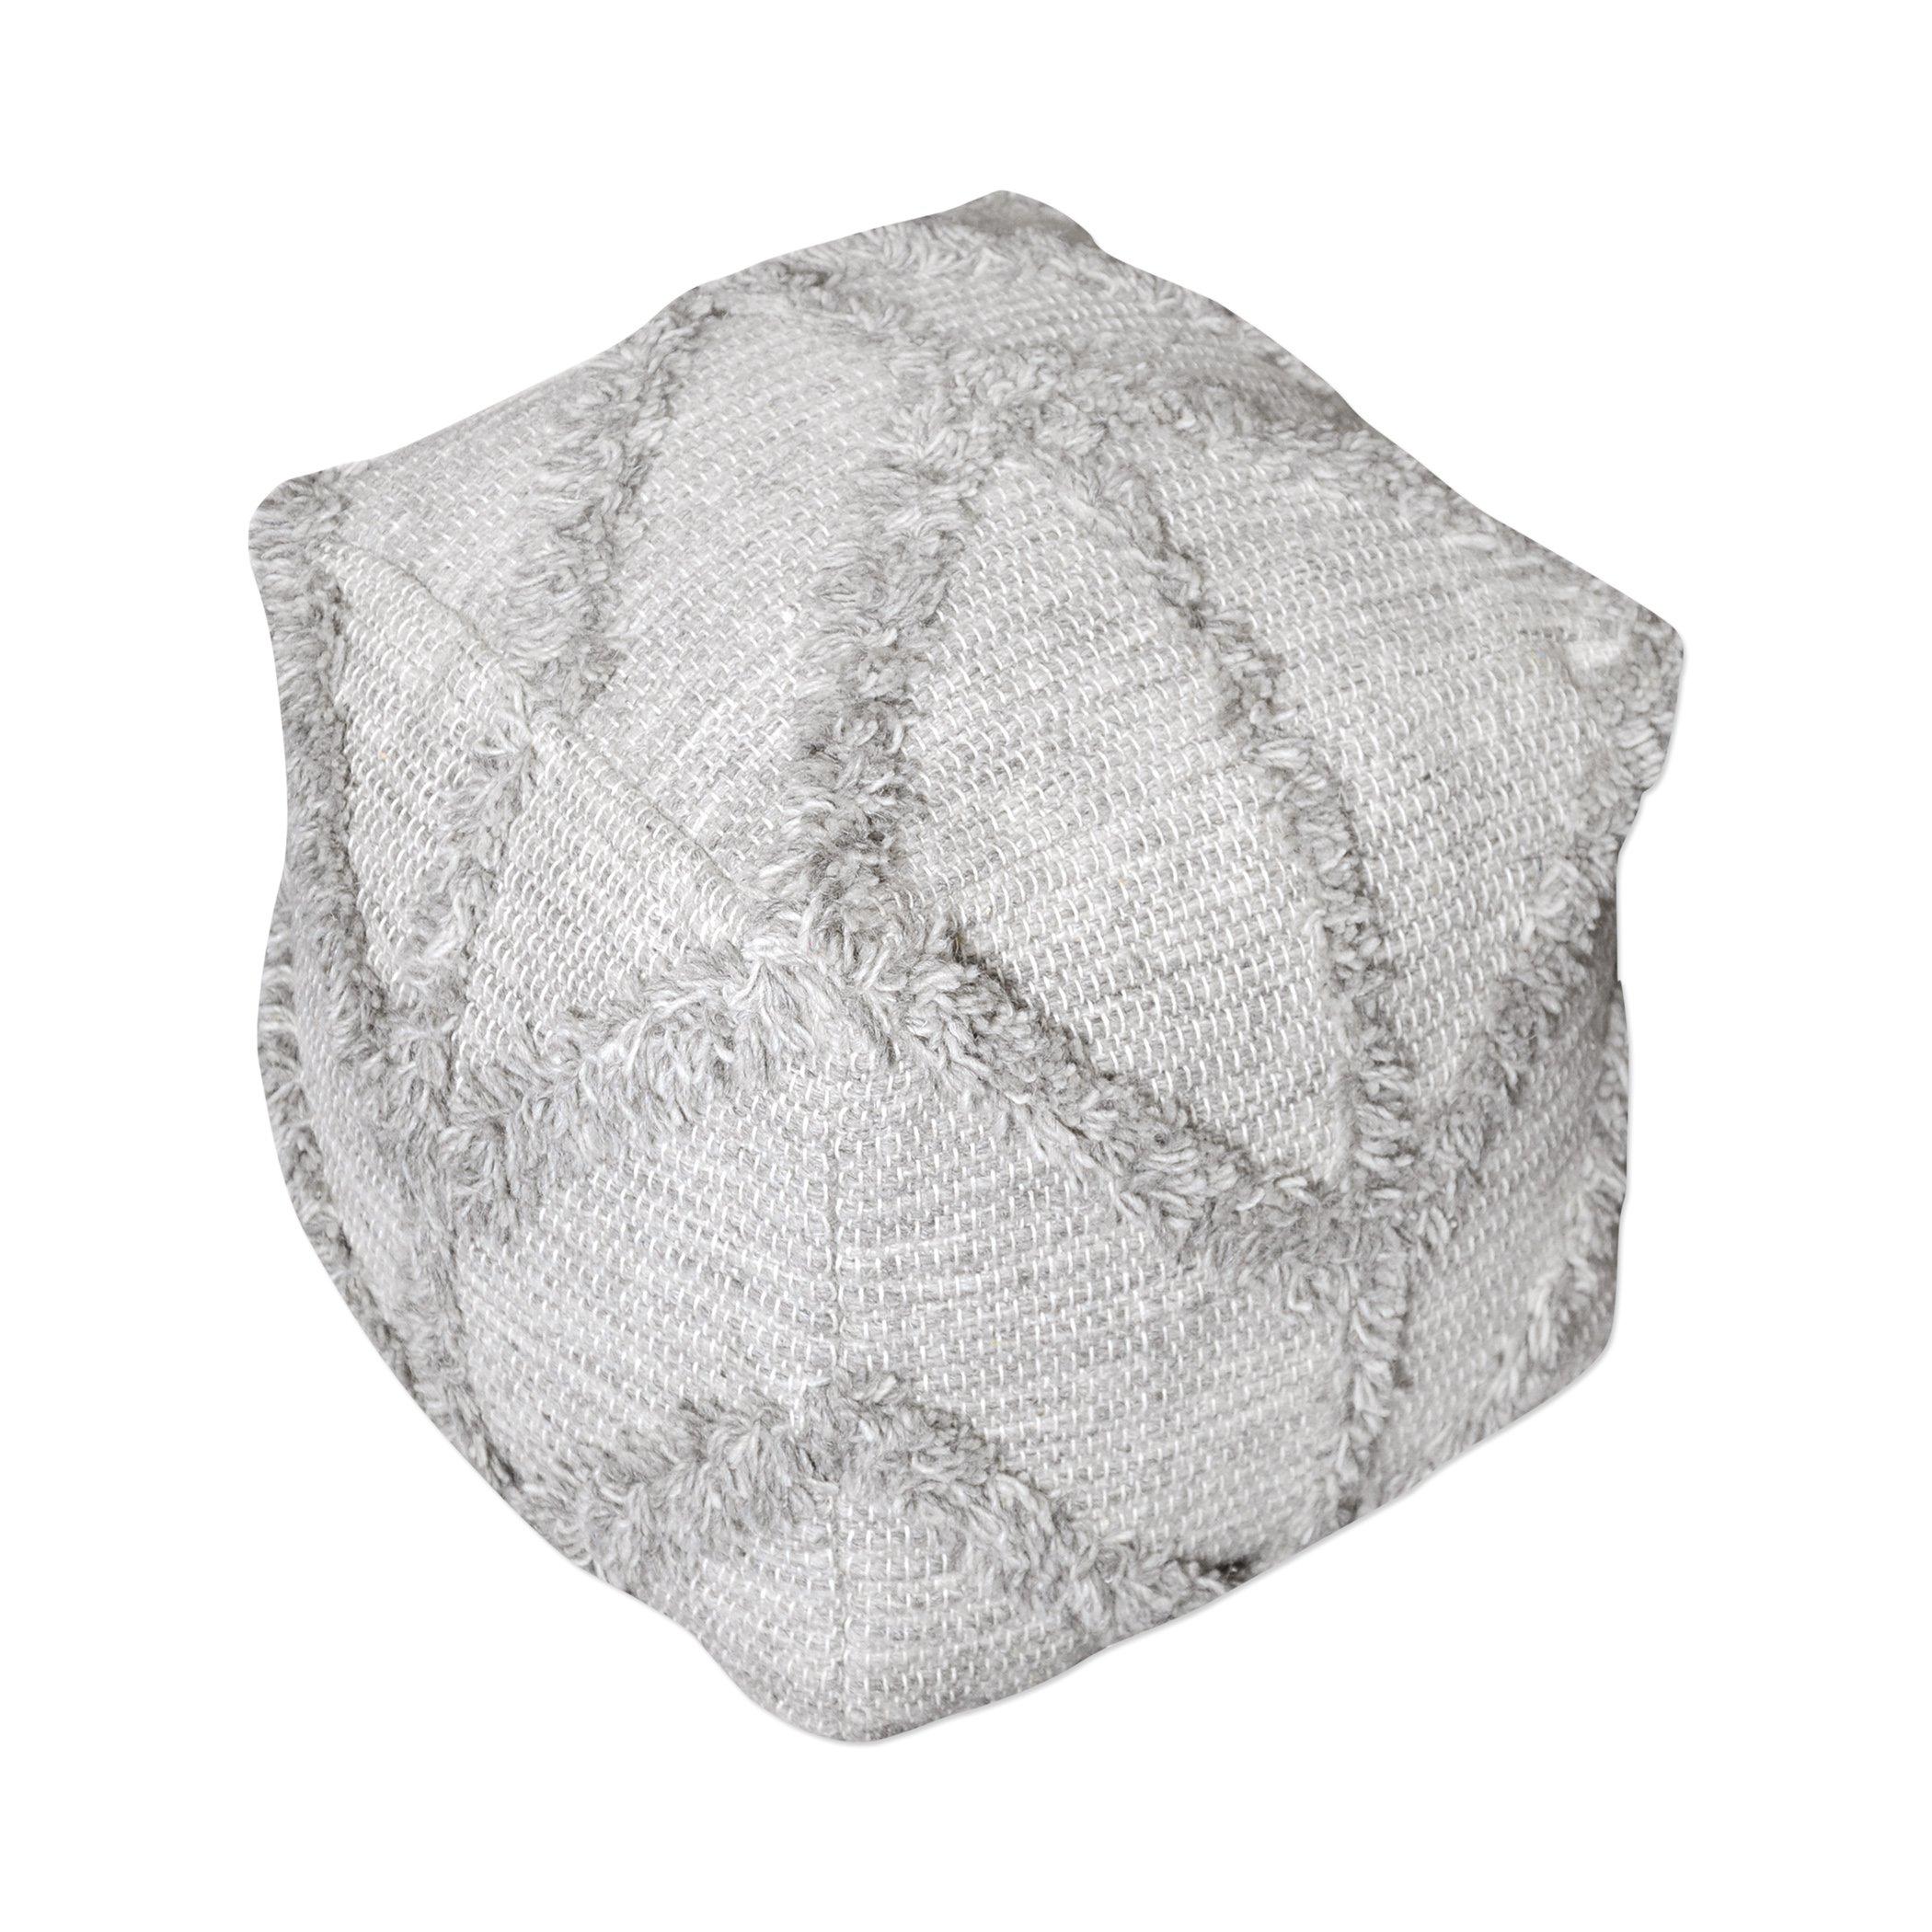 Chevron Gray Textured Fringe Wool Pouf   Cube Raised Shaggy Retro Seat Square